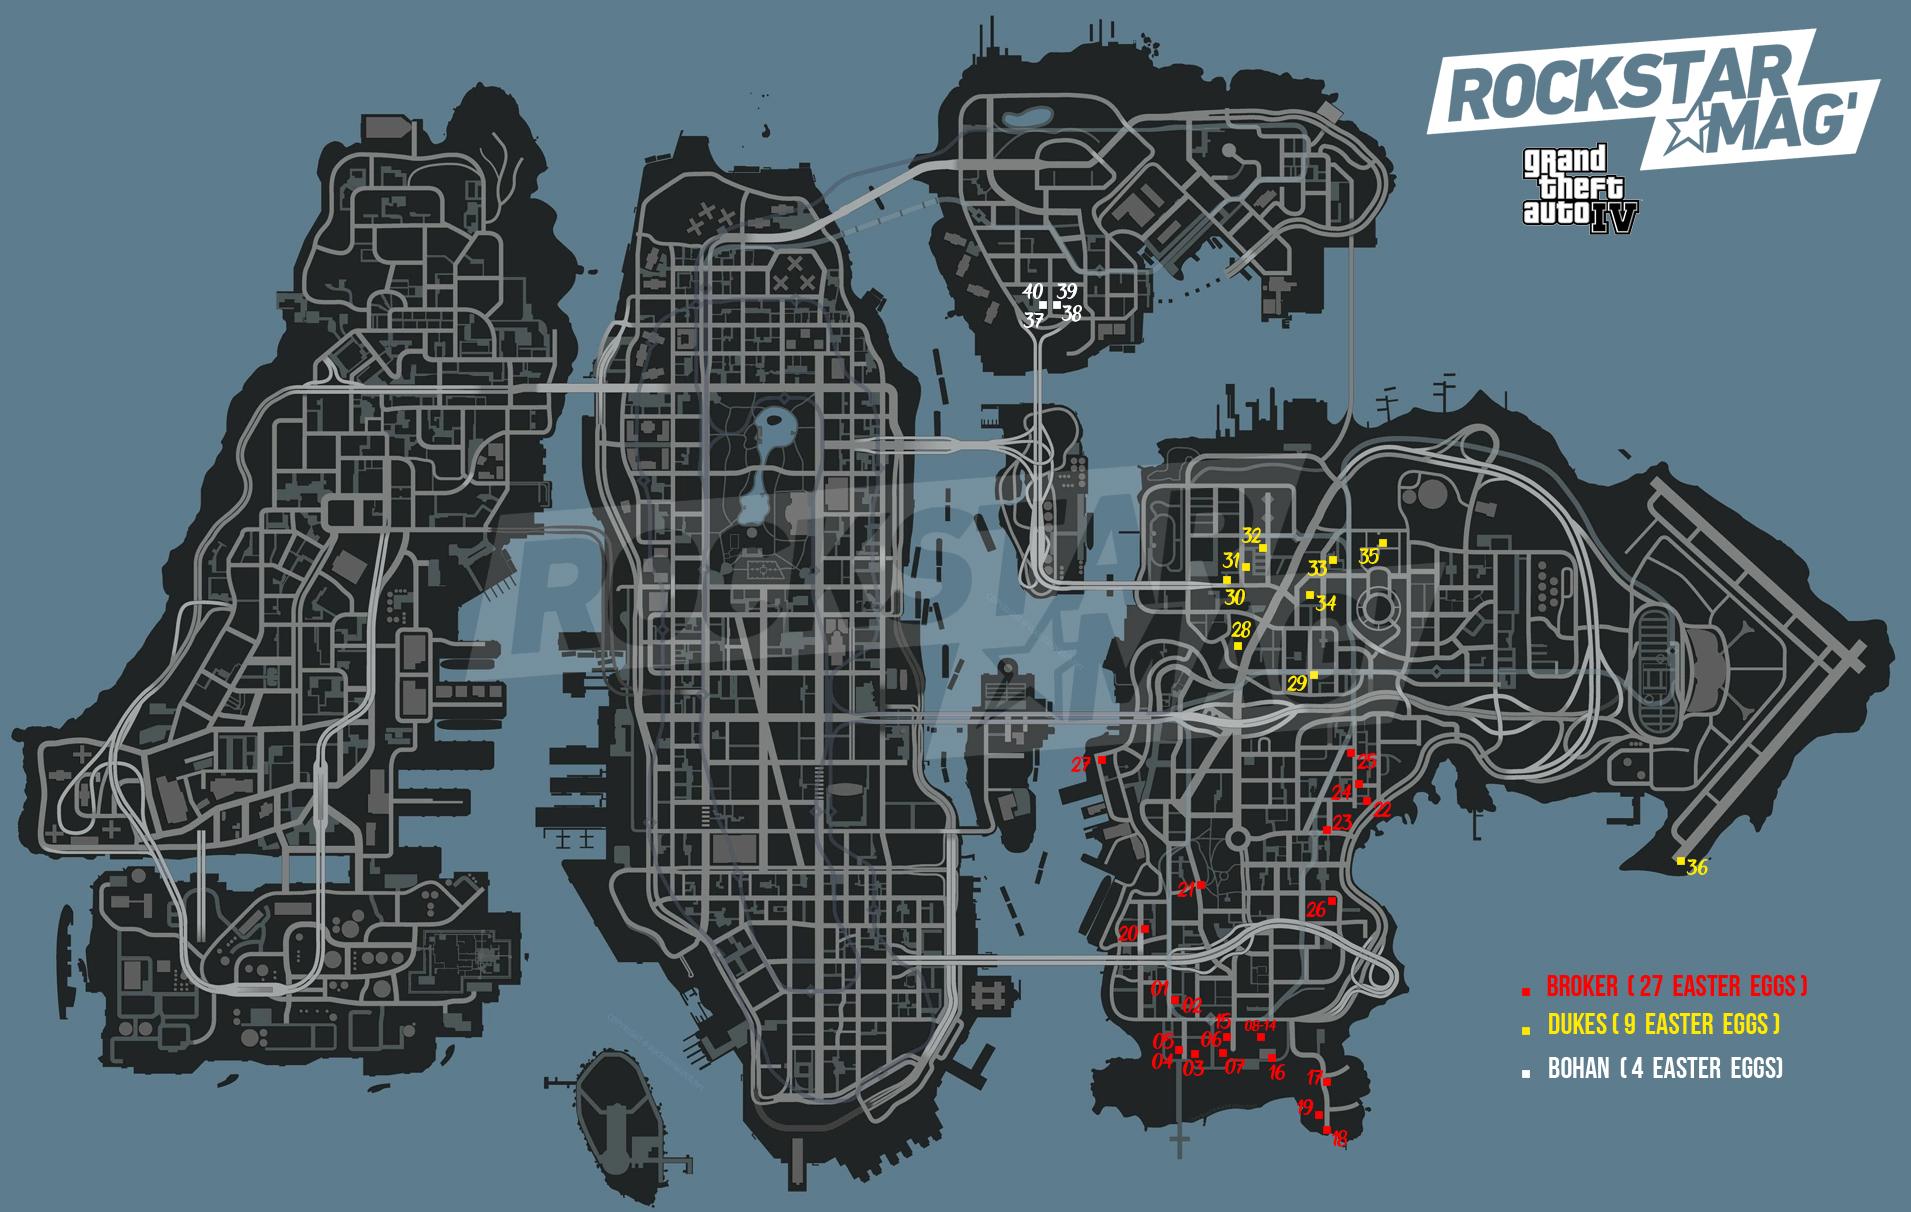 GTA IV - Map Easter Eggs Grand Theft Auto IV - Rockstar Mag